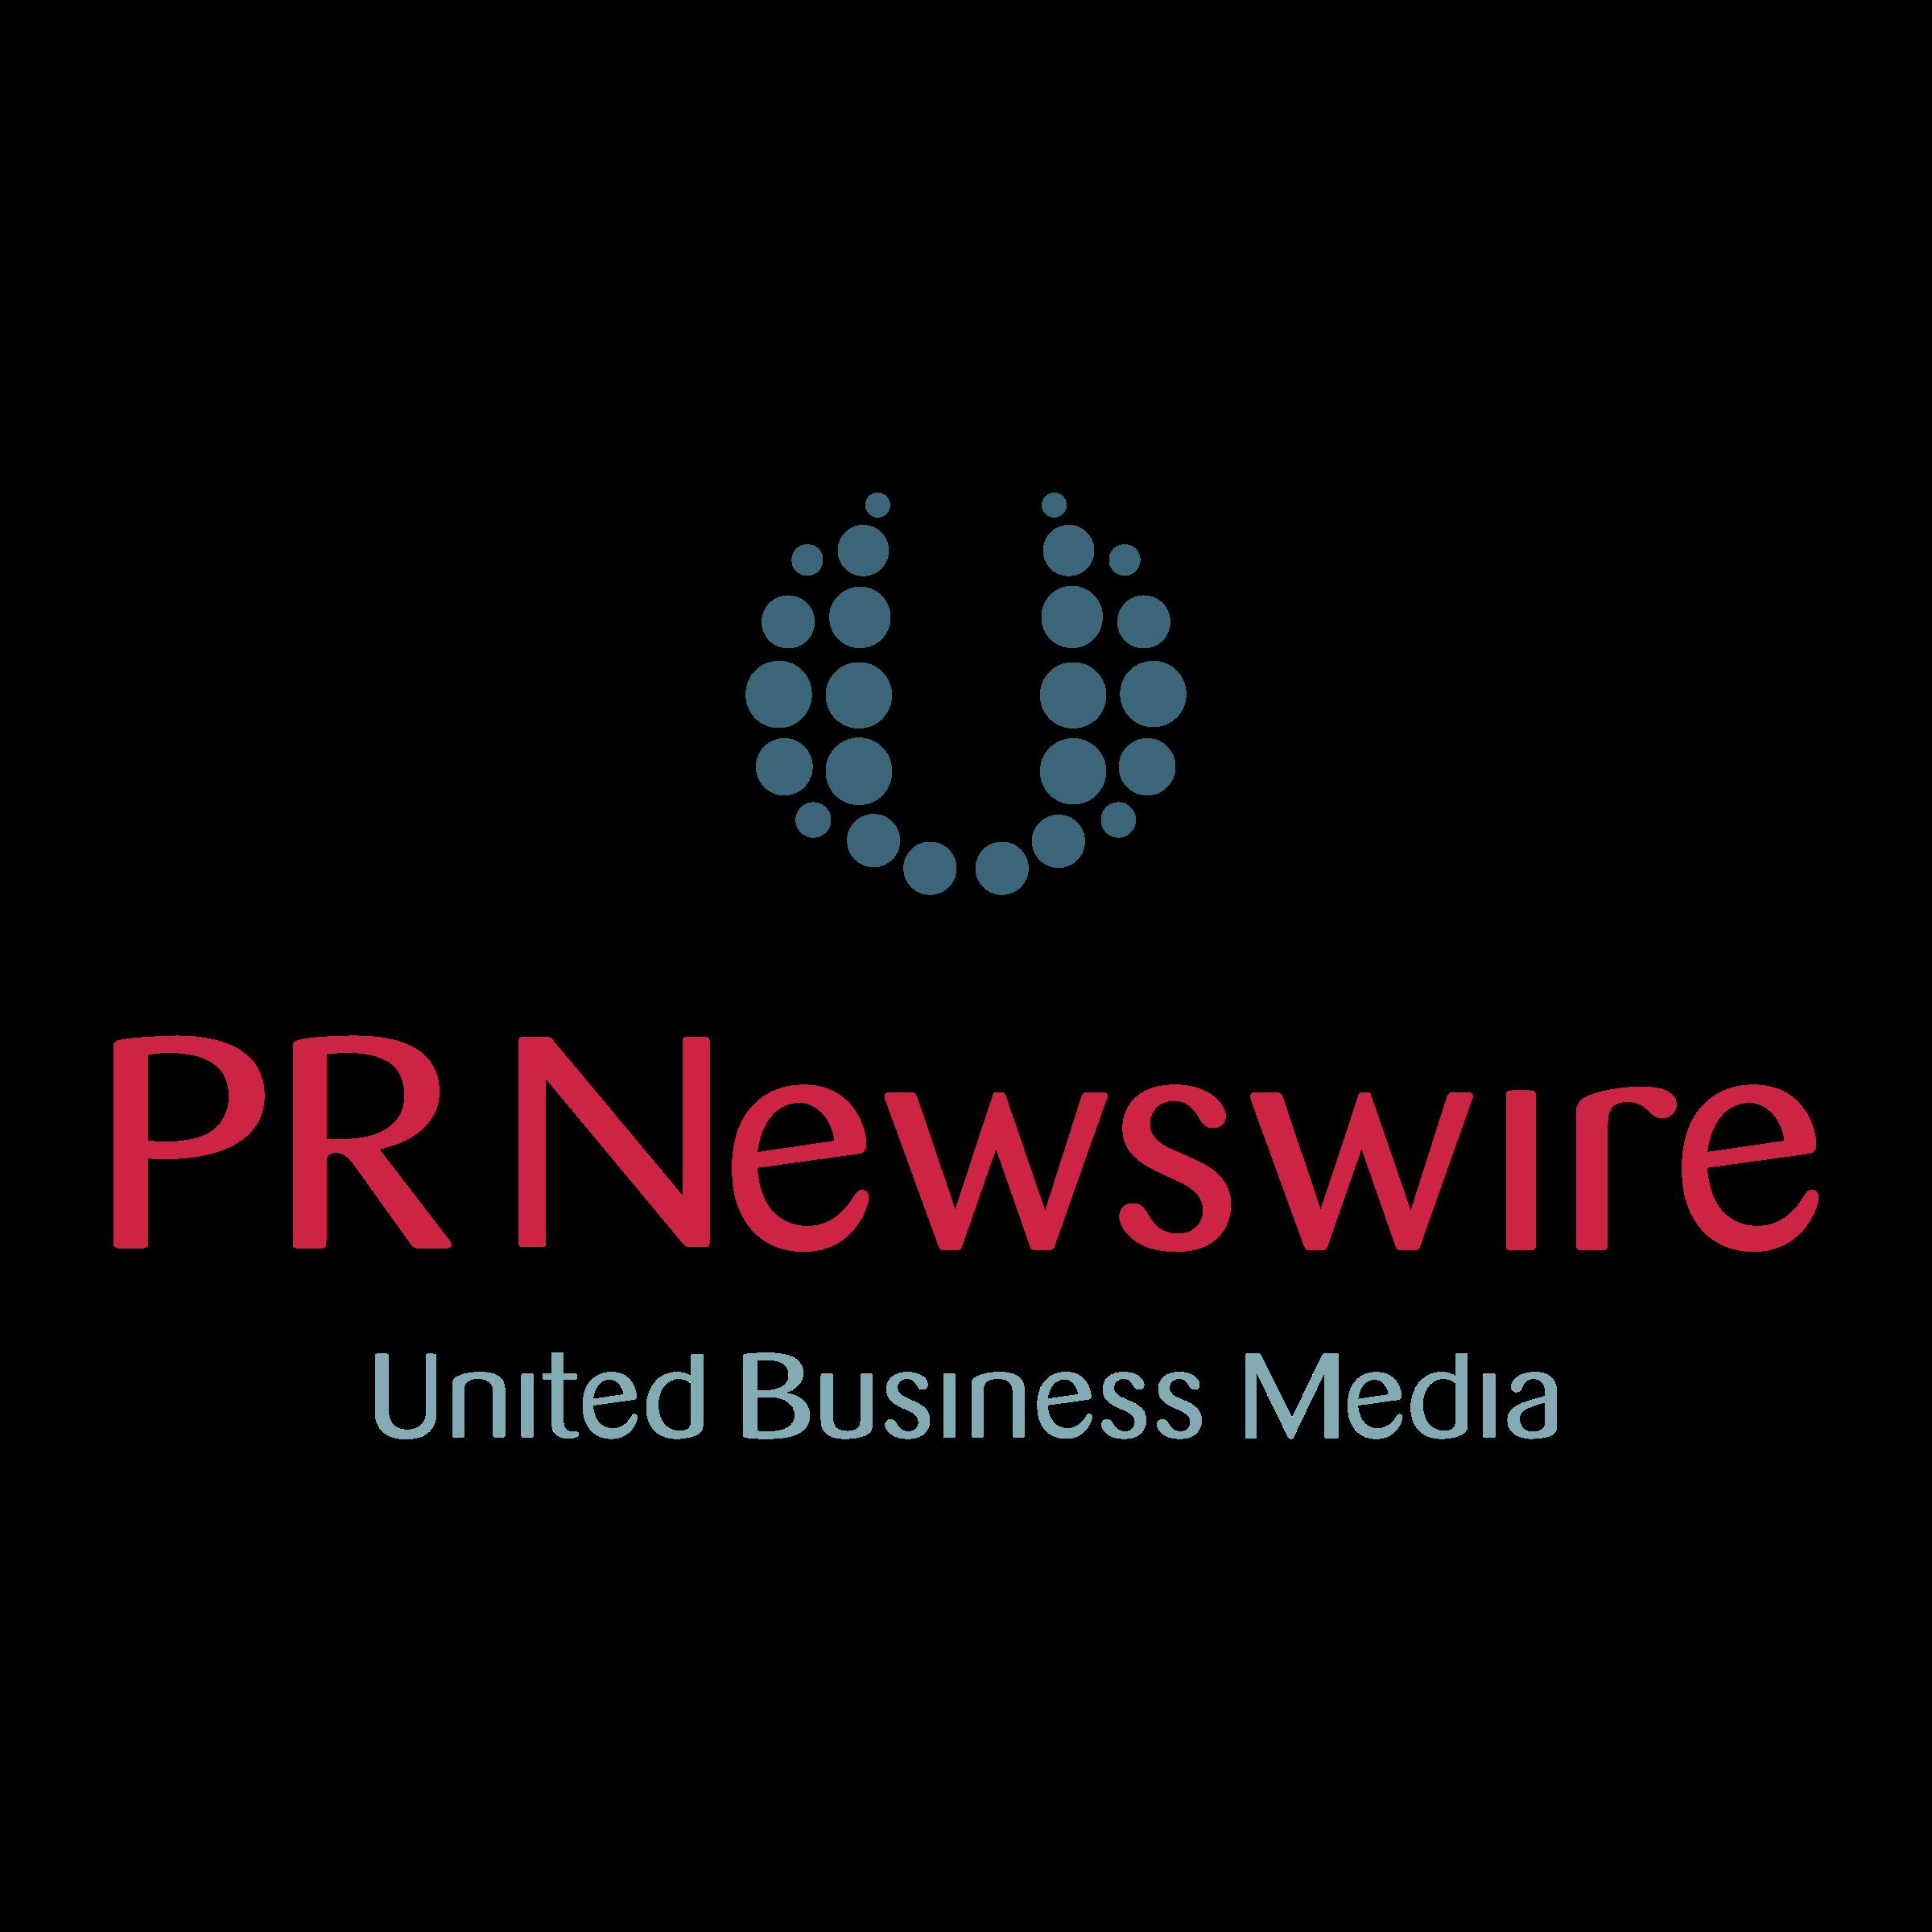 PR Newswire.png